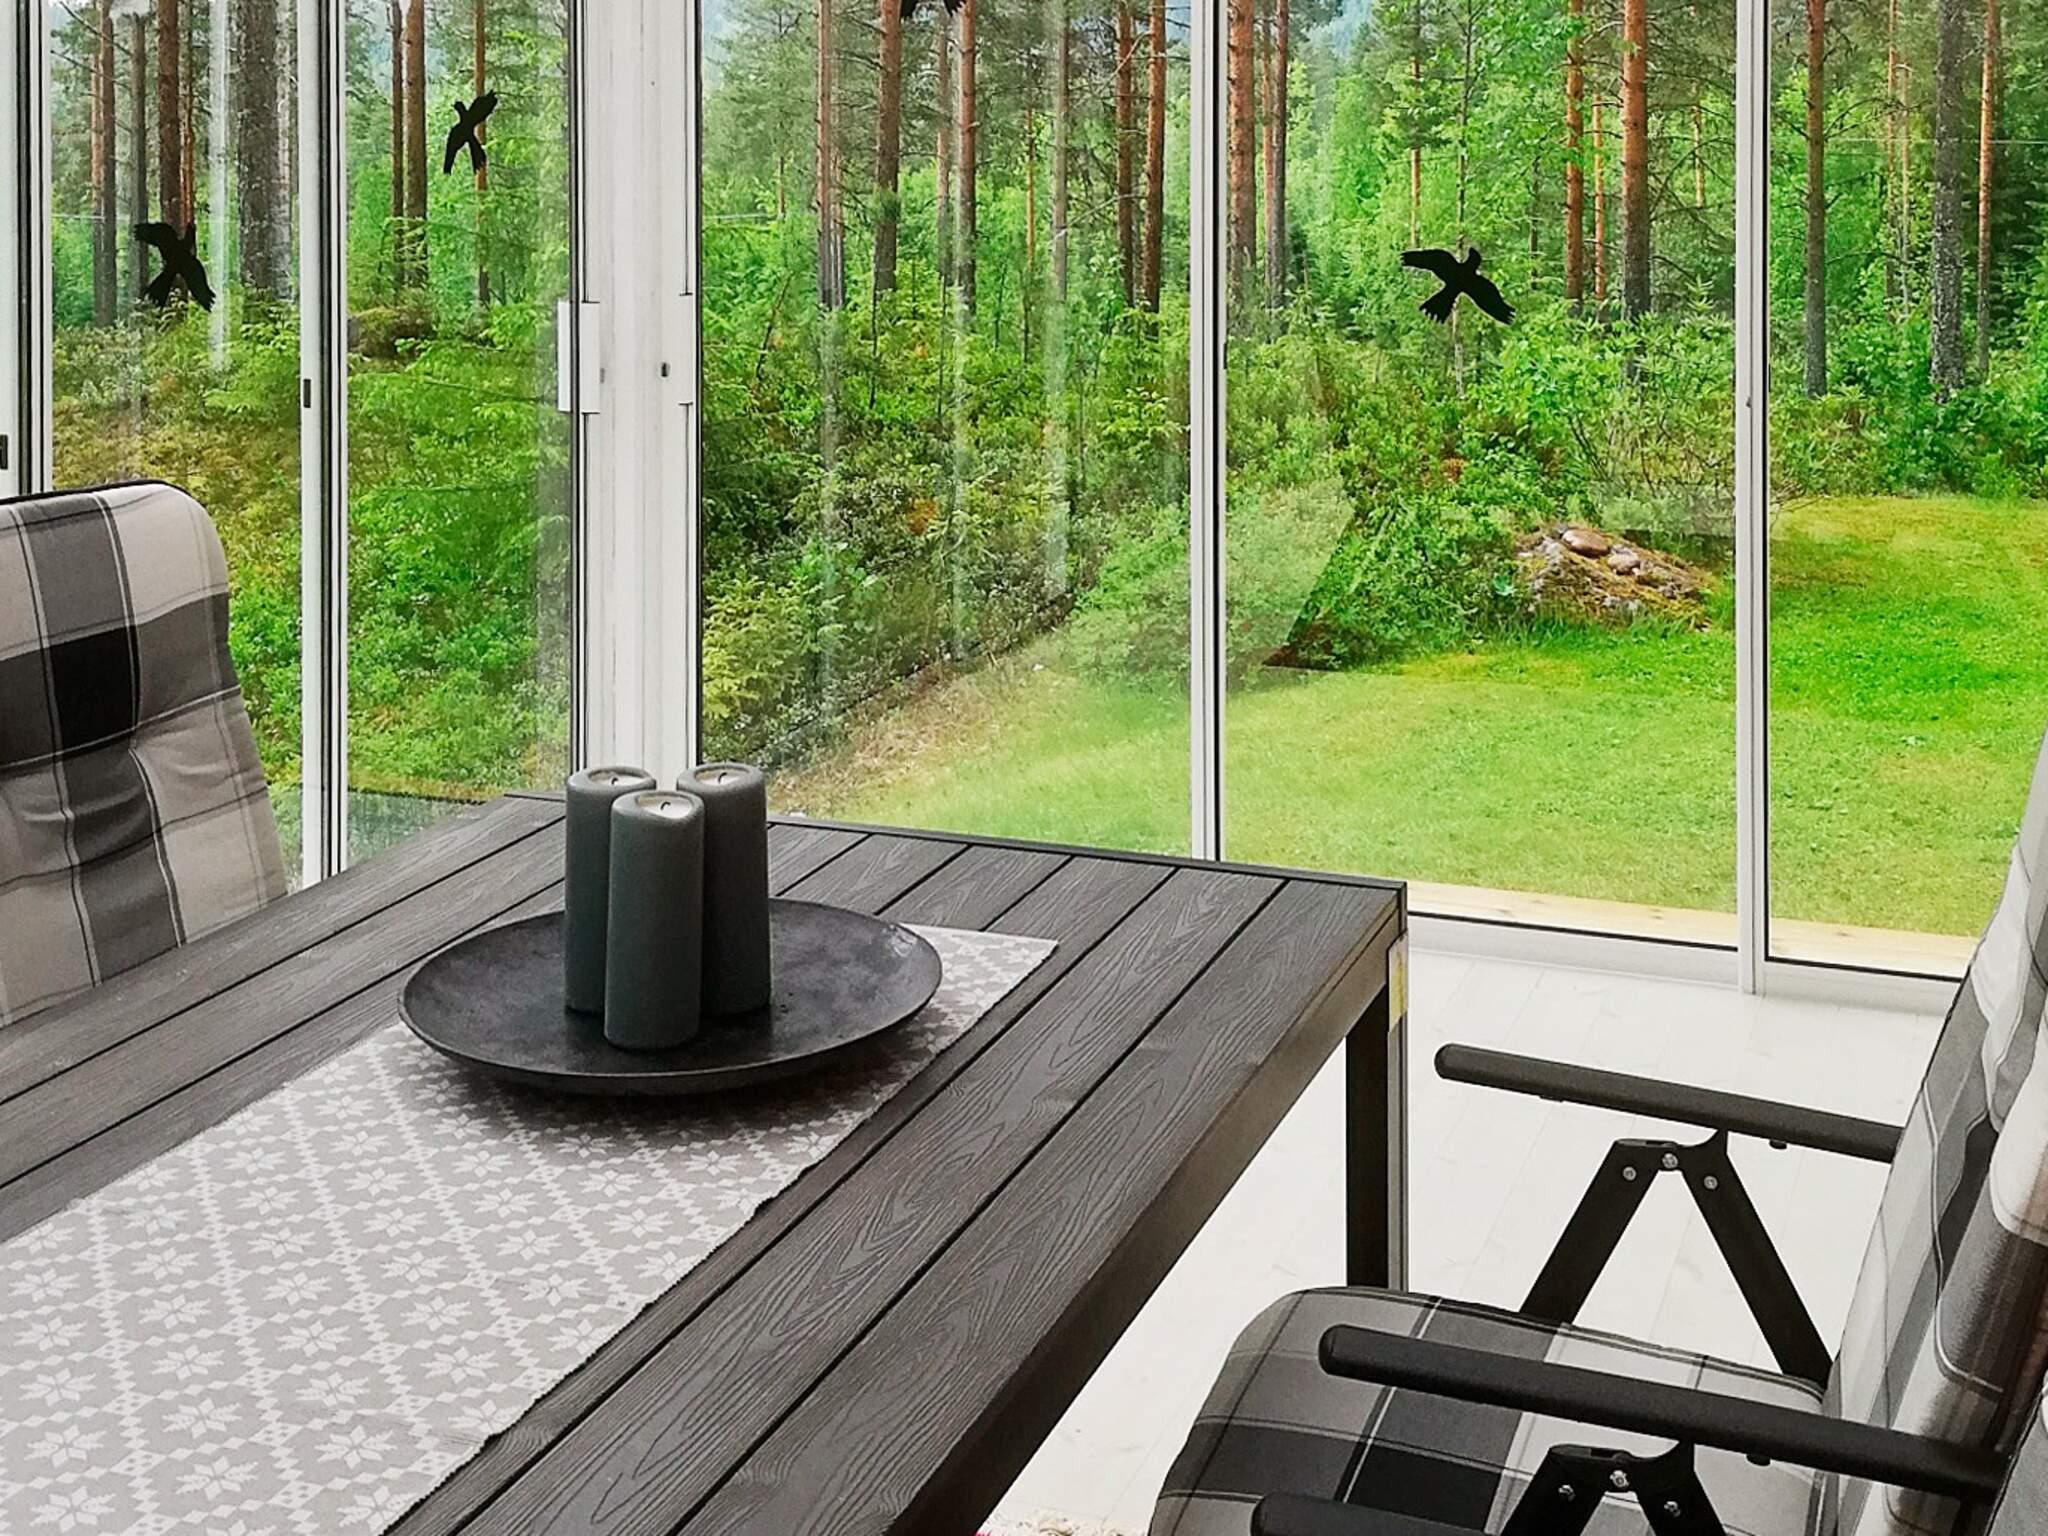 Ferienhaus Ivebo (87165), Östmark, Värmlands län, Mittelschweden, Schweden, Bild 2